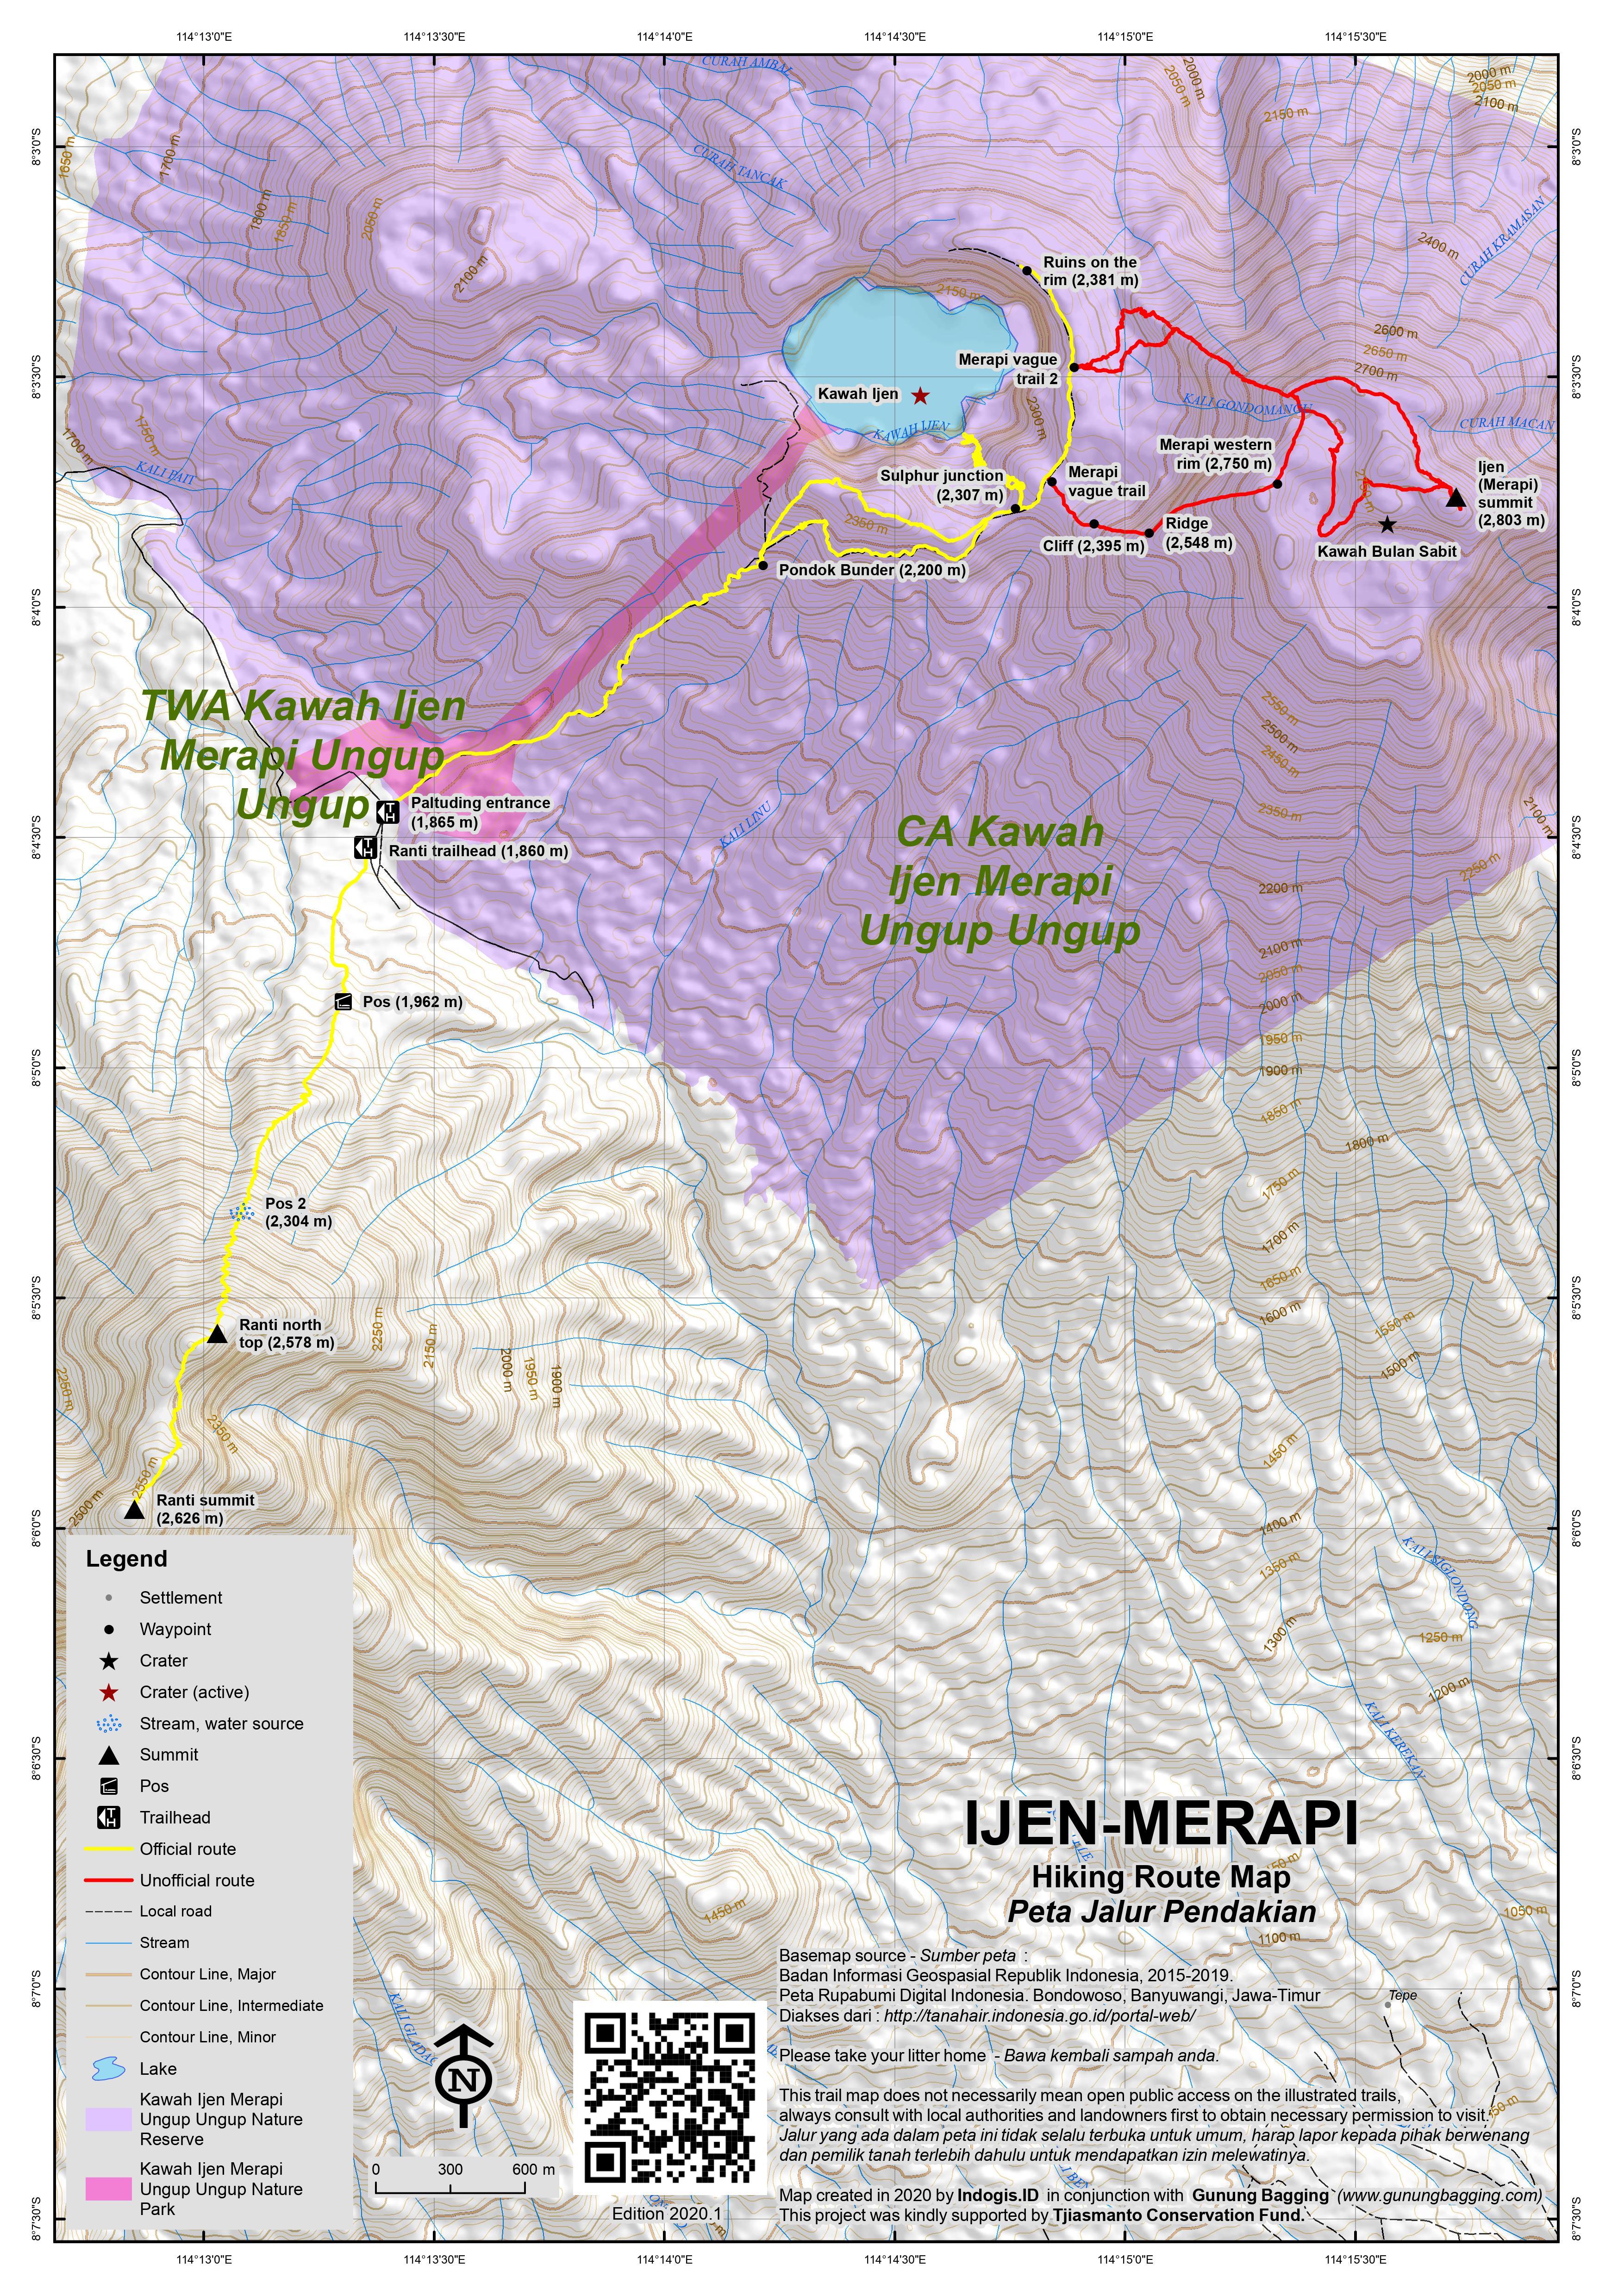 Peta Jalur Pendakian Gunung Ijen